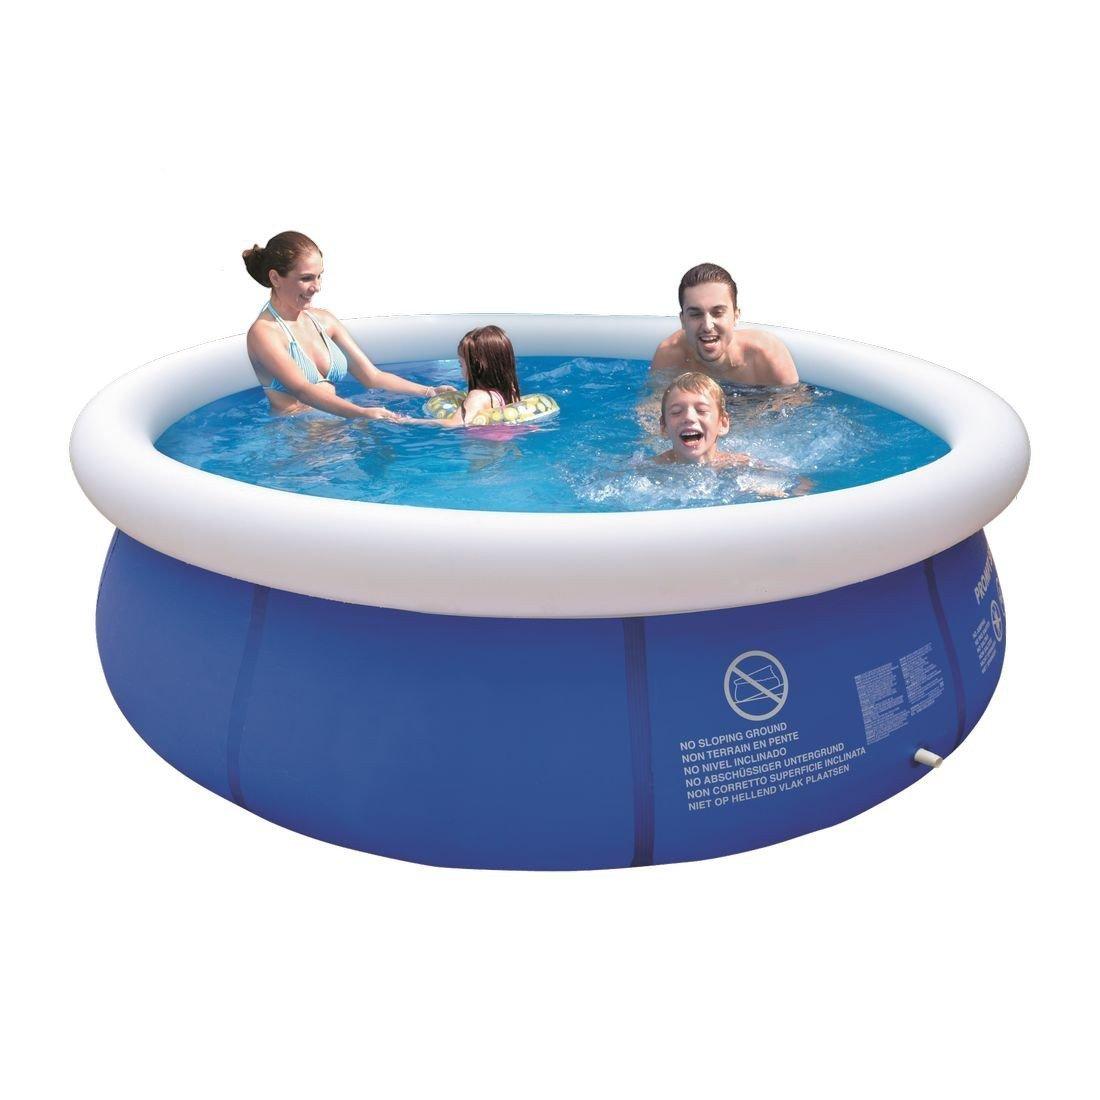 "Jilong 15x36"" Prompt Set Inflatable Pool"